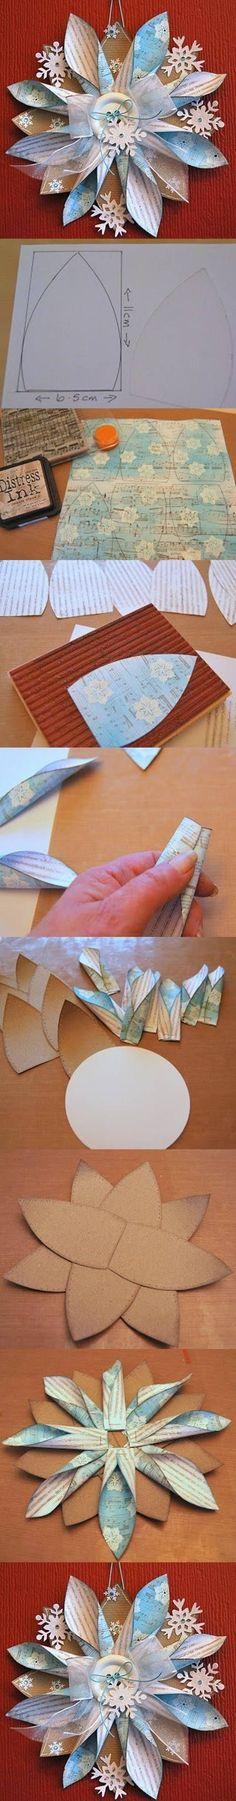 DIY Paper Flower Ornaments